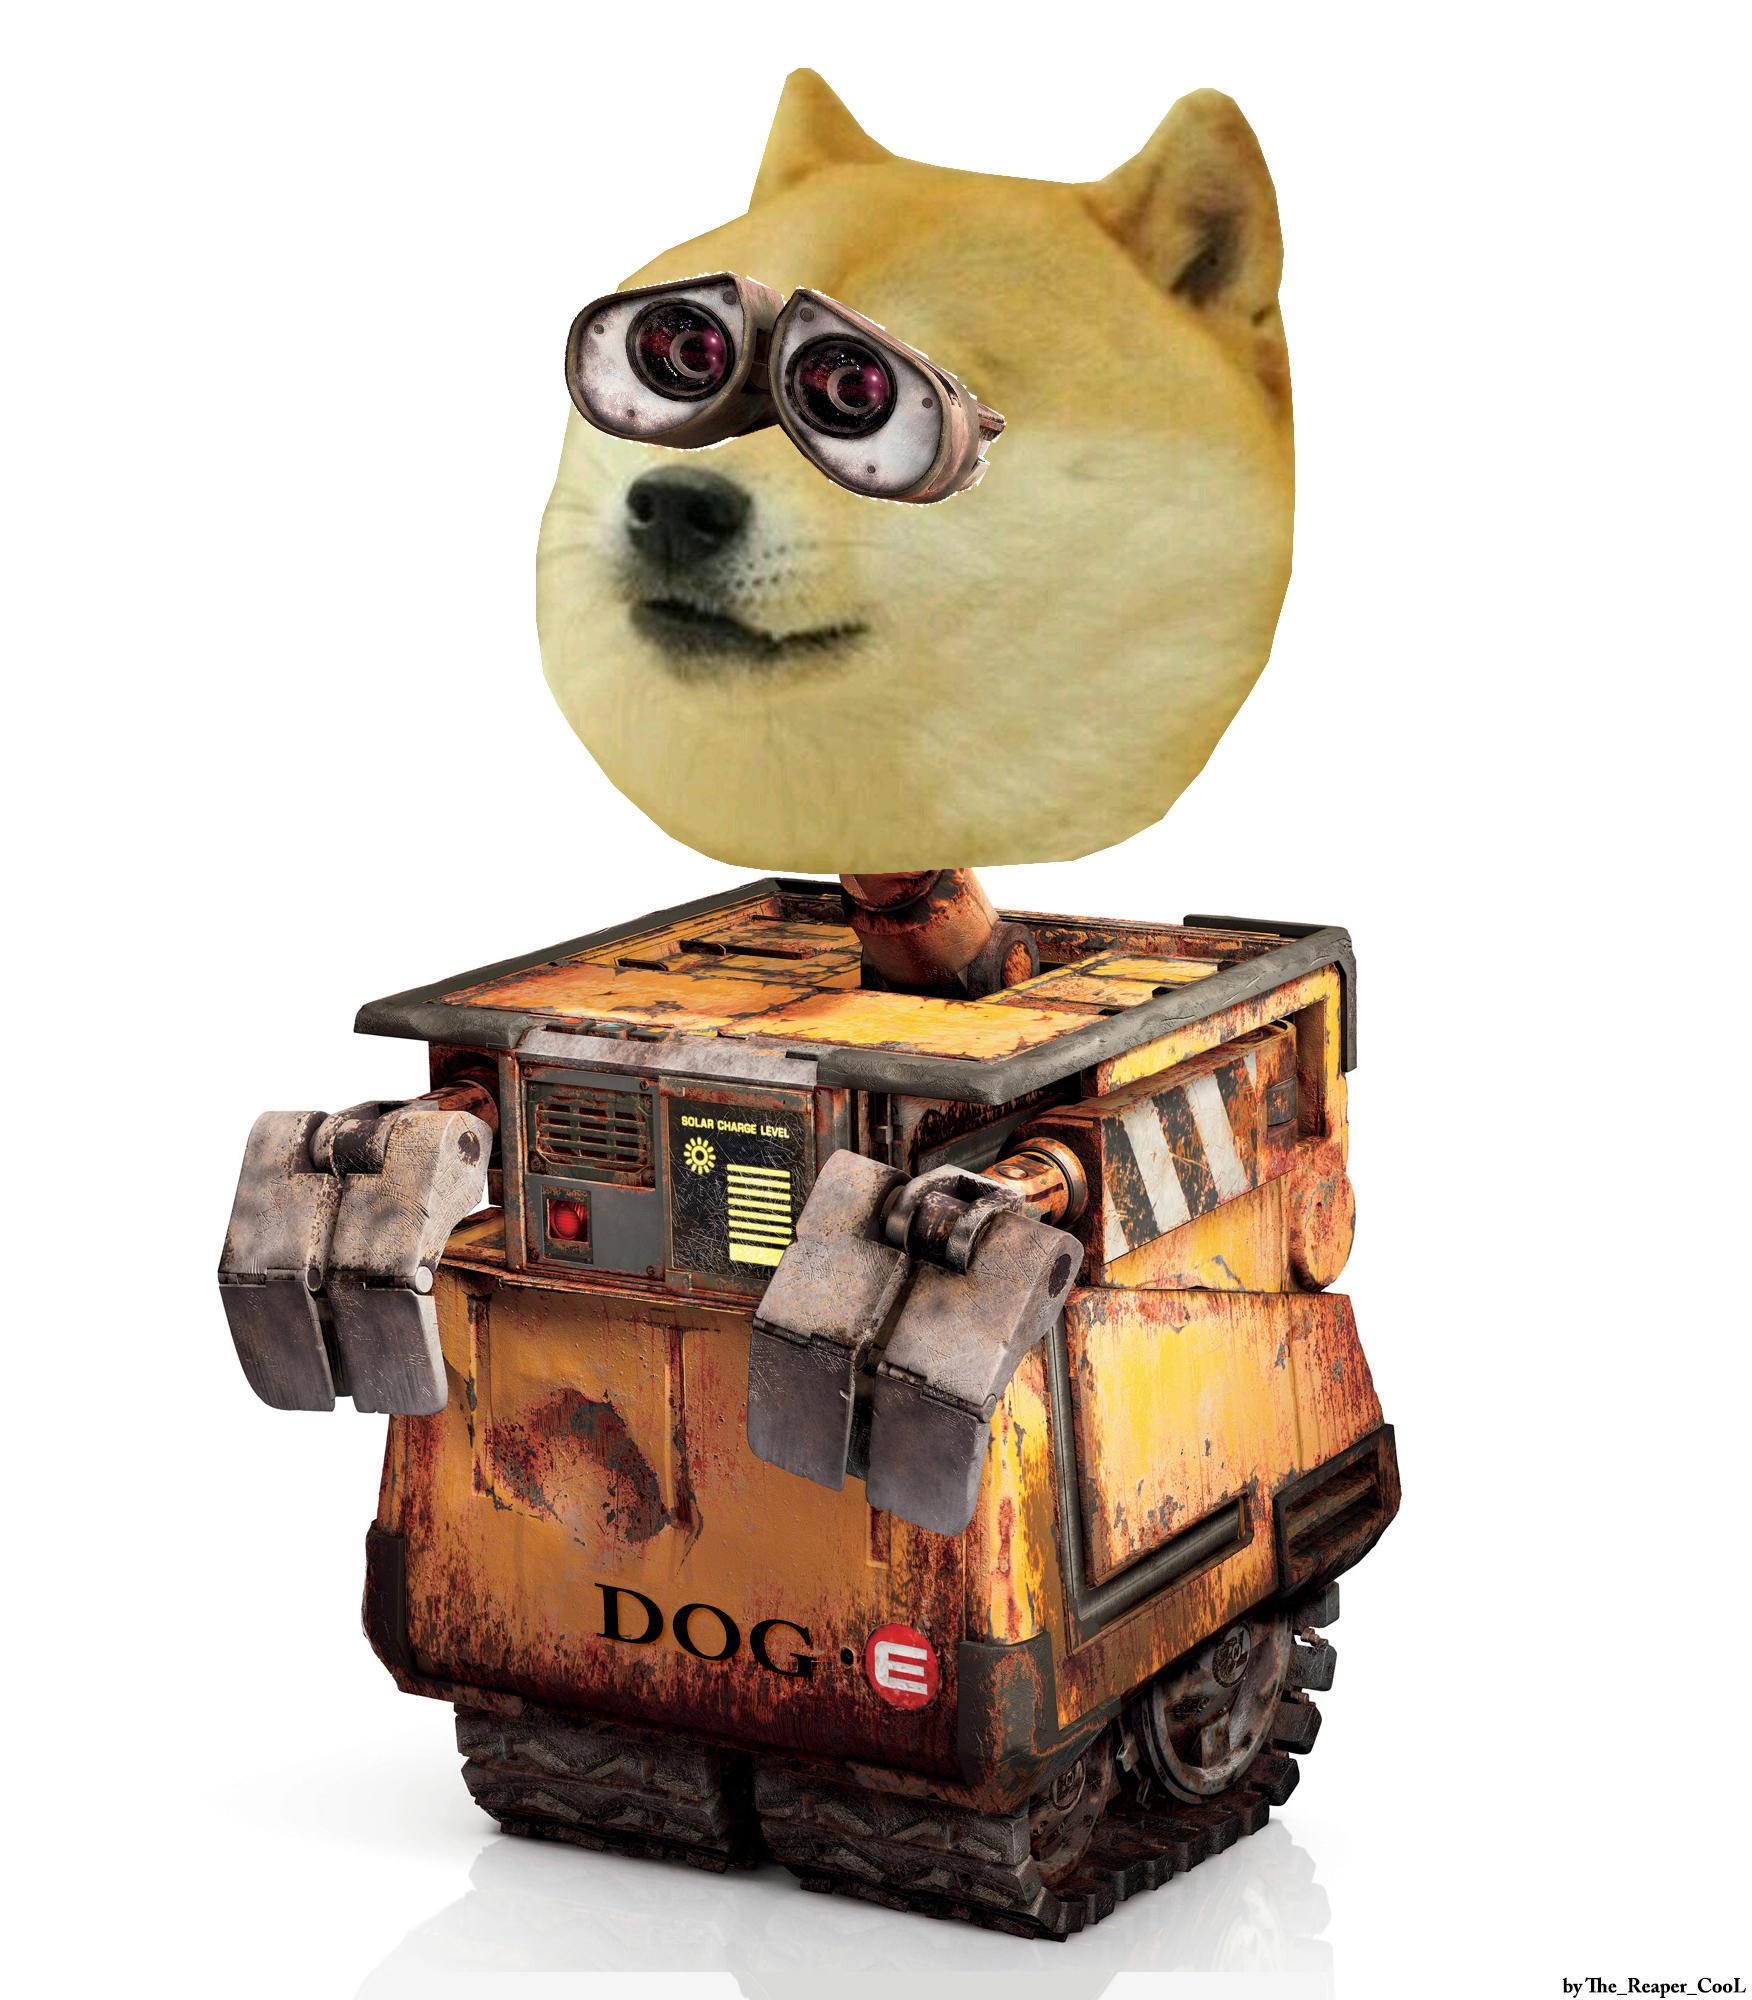 Dog-E | Doge | Know Your Meme